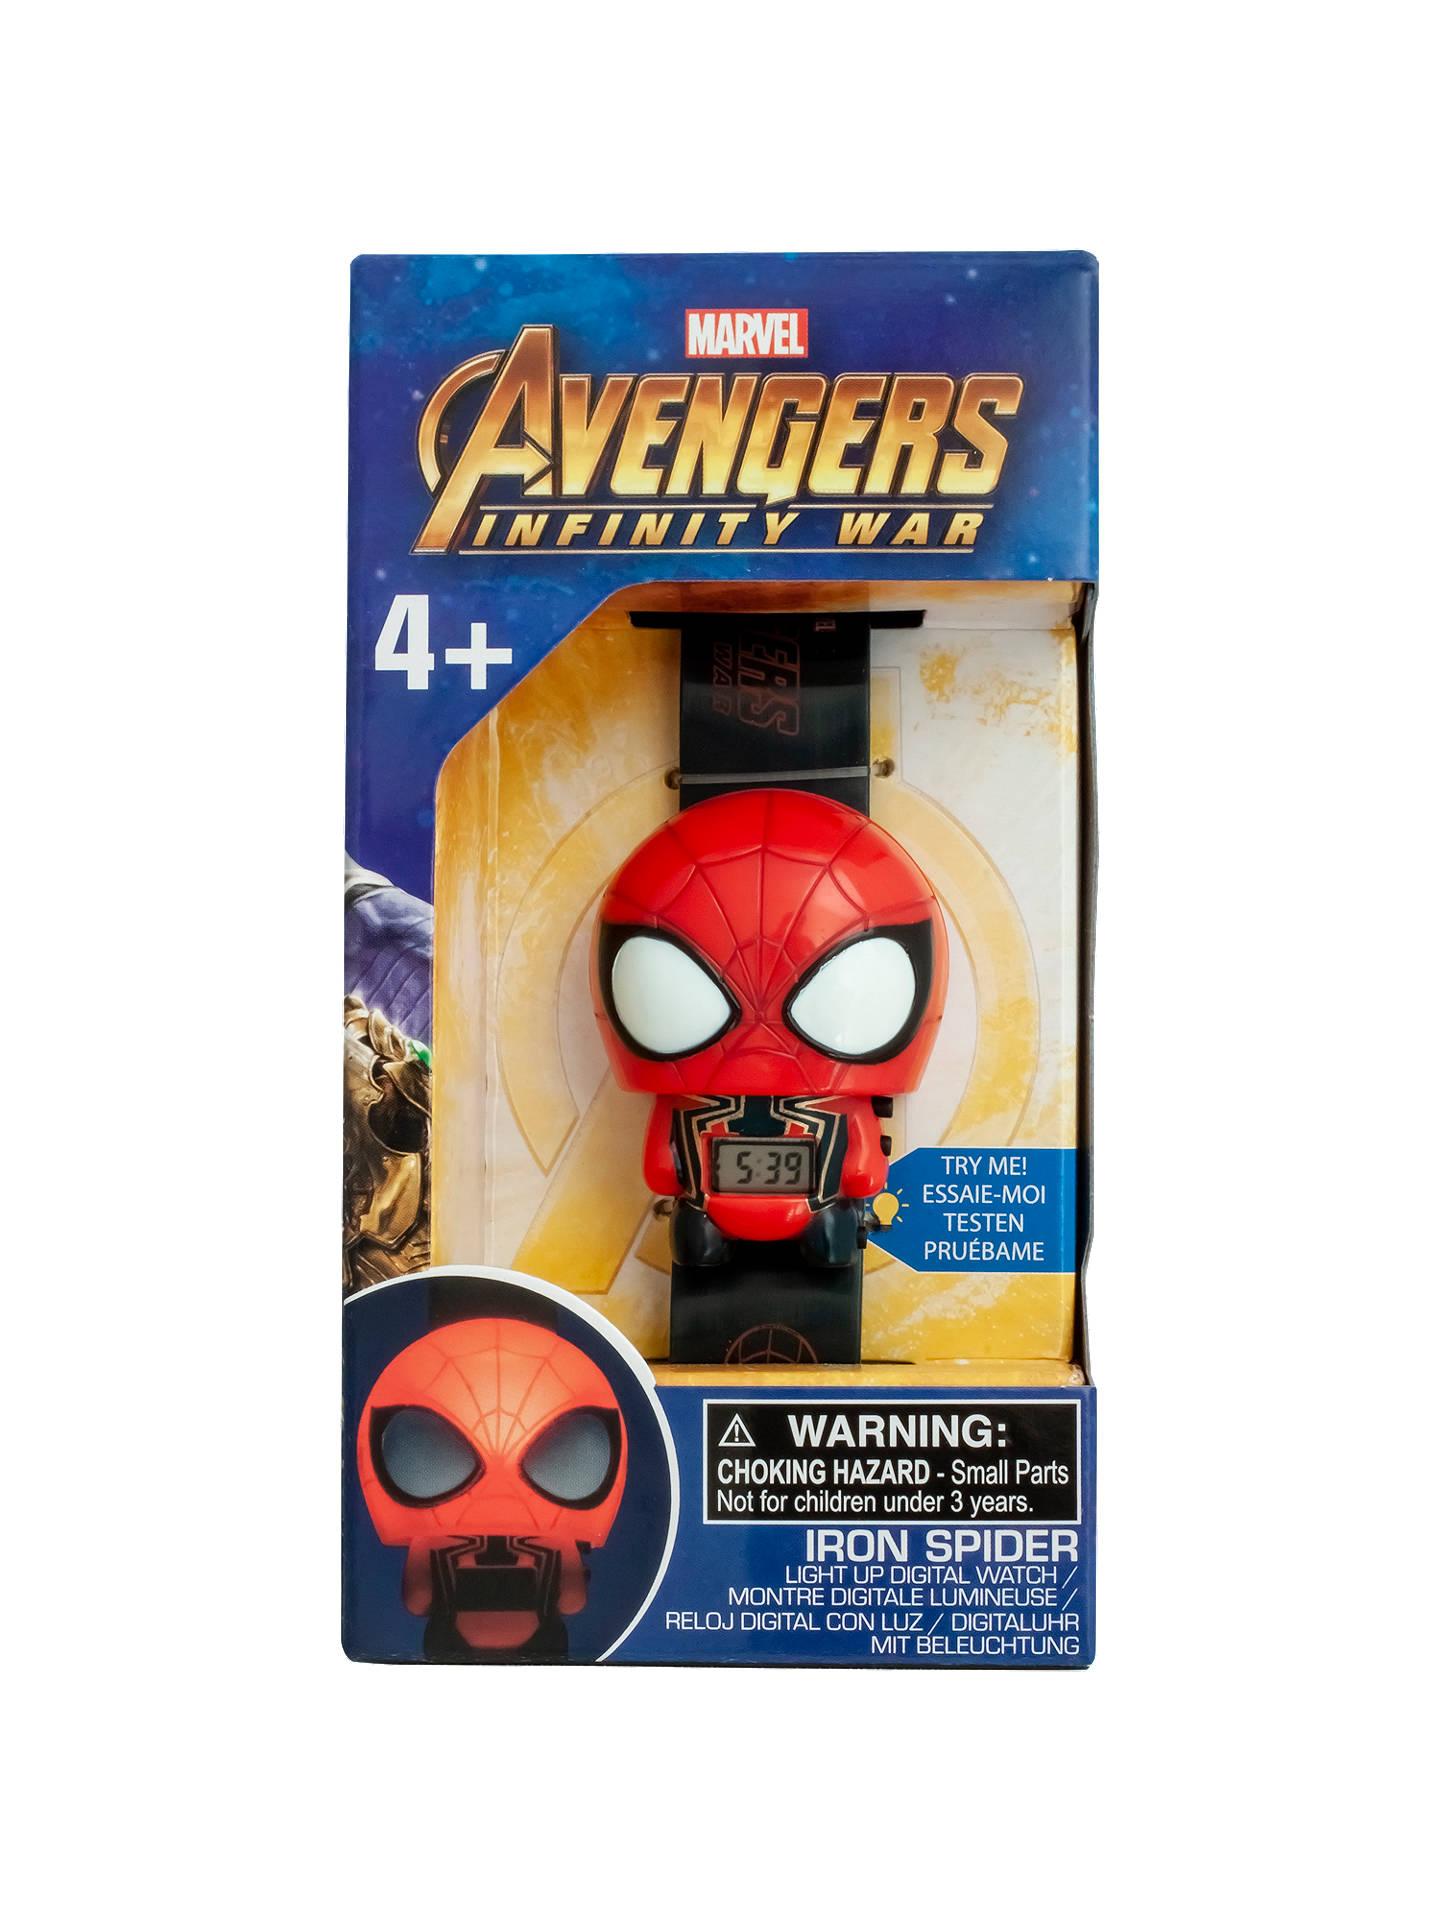 ca676c45f57f Buy BulbBotz Marvel Avengers  Infinity War Iron Spider Light-Up Watch  Online at johnlewis ...